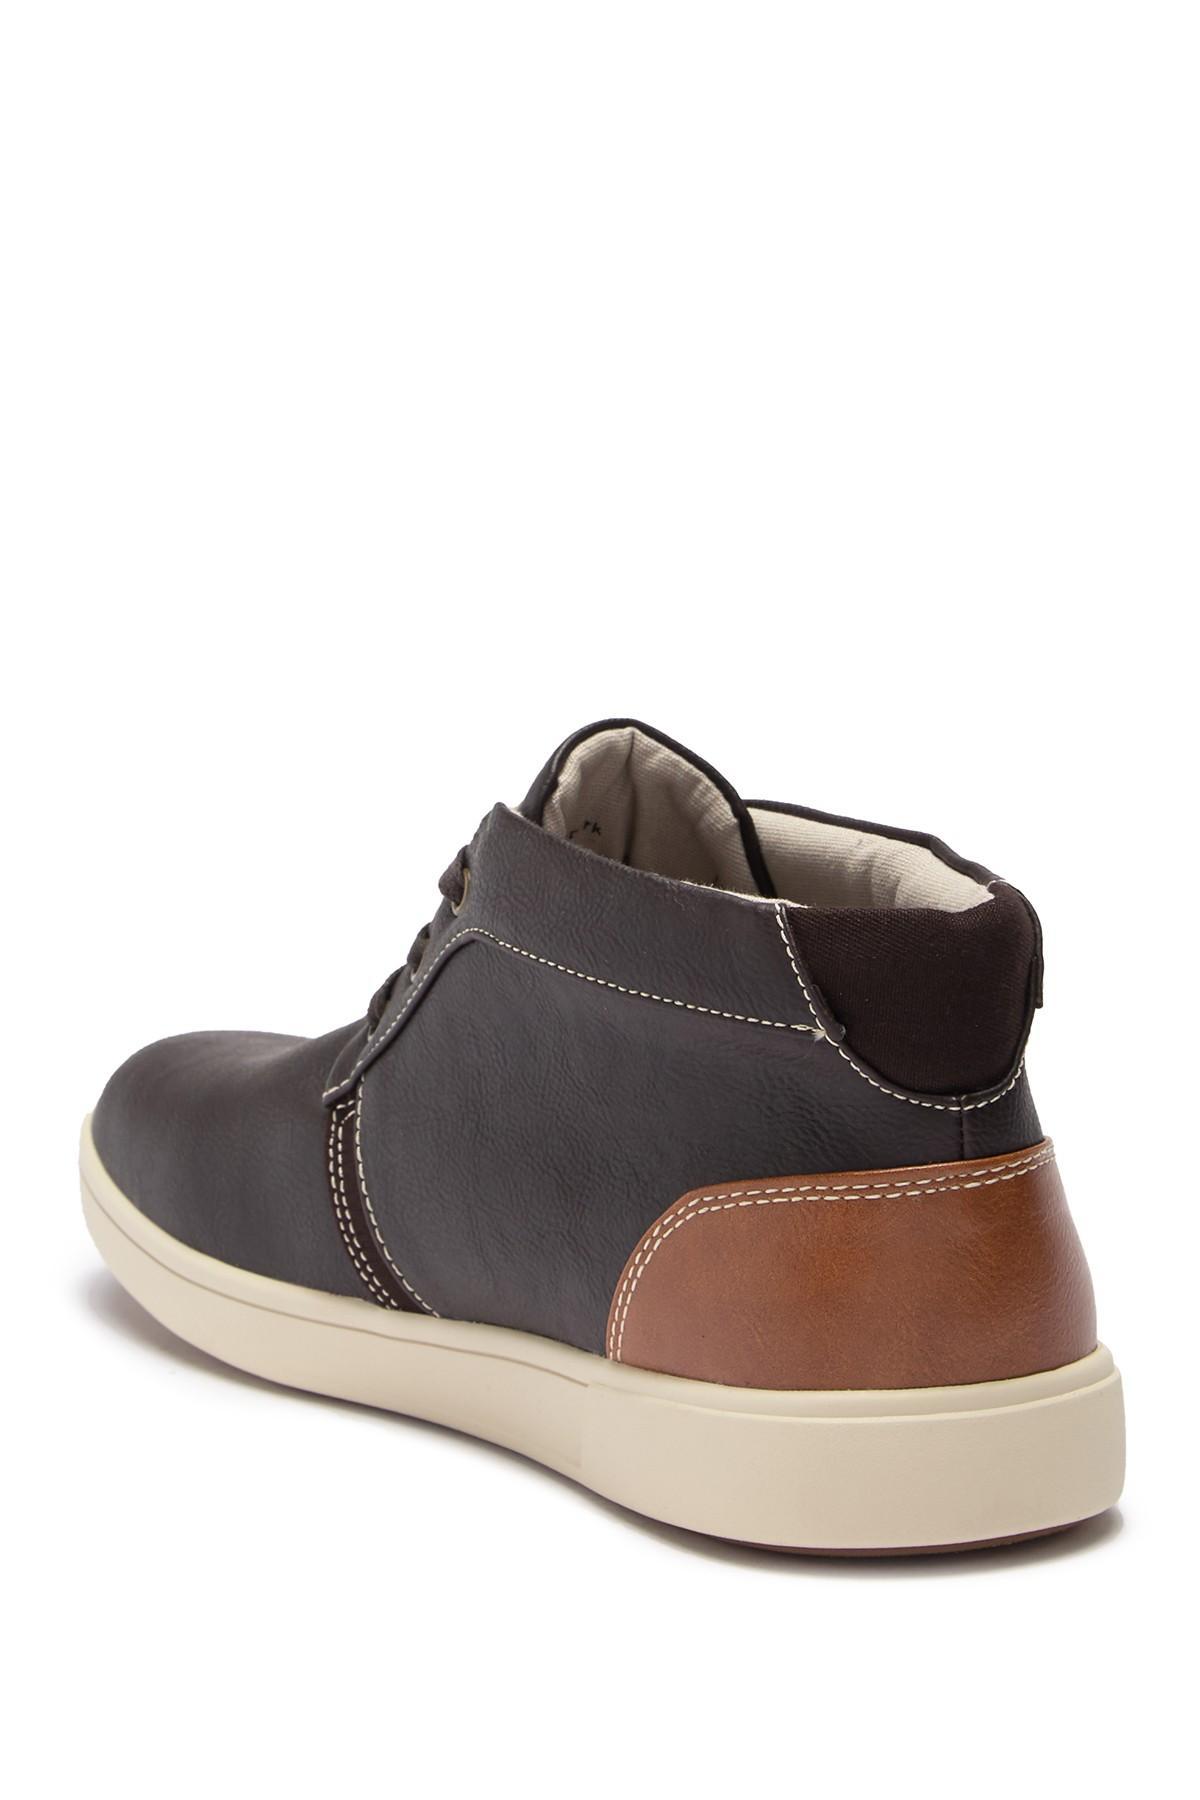 Steve Madden Park Casual Sneaker in